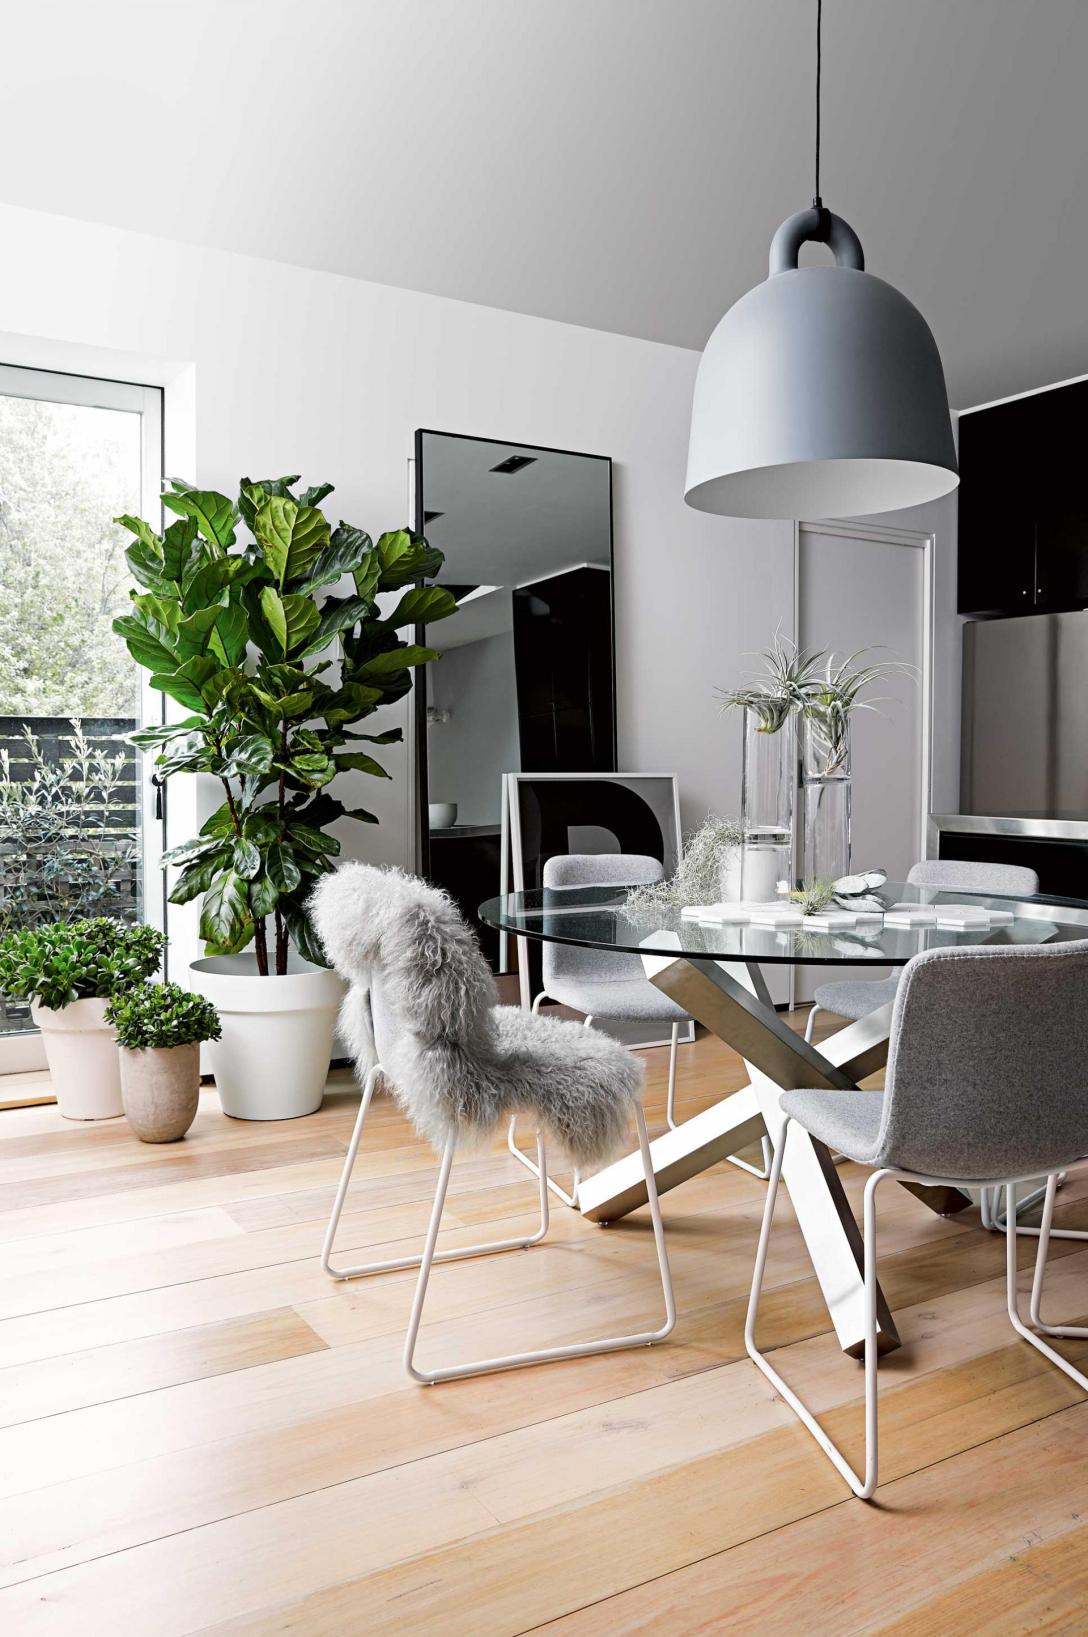 dining-room-grey-pot-plants-floorboards-sept15-20150914152324~q75,dx1920y-u1r1g0,c--